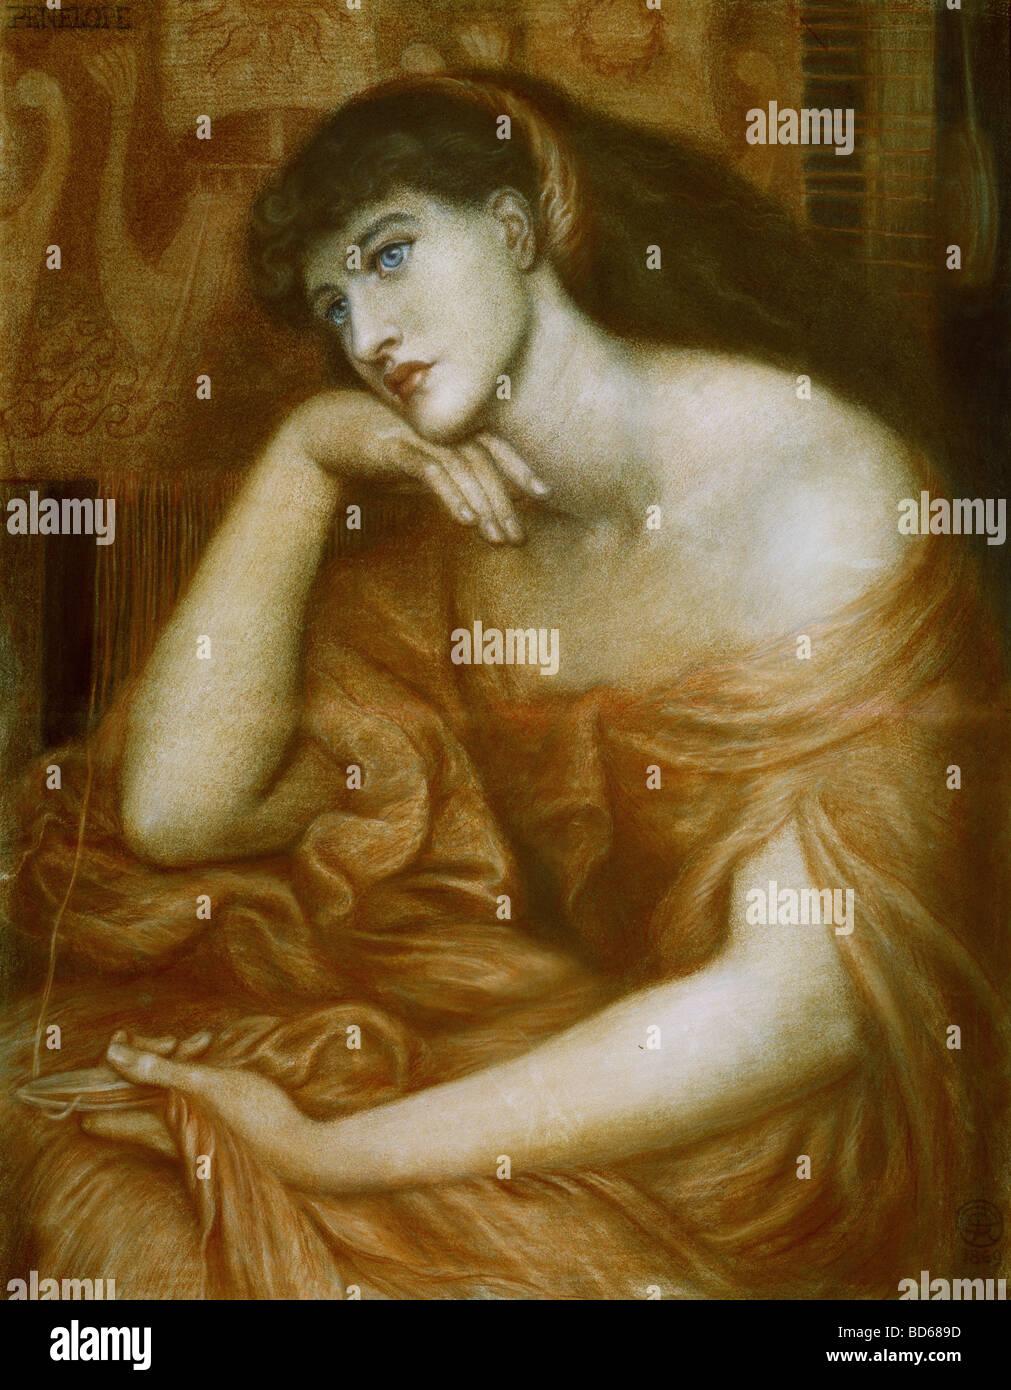 "Bellas artes, Dante Gabriel Rossetti (1828 - 1882), pintura, ""Penélope"", óleo sobre lienzo, Imagen De Stock"